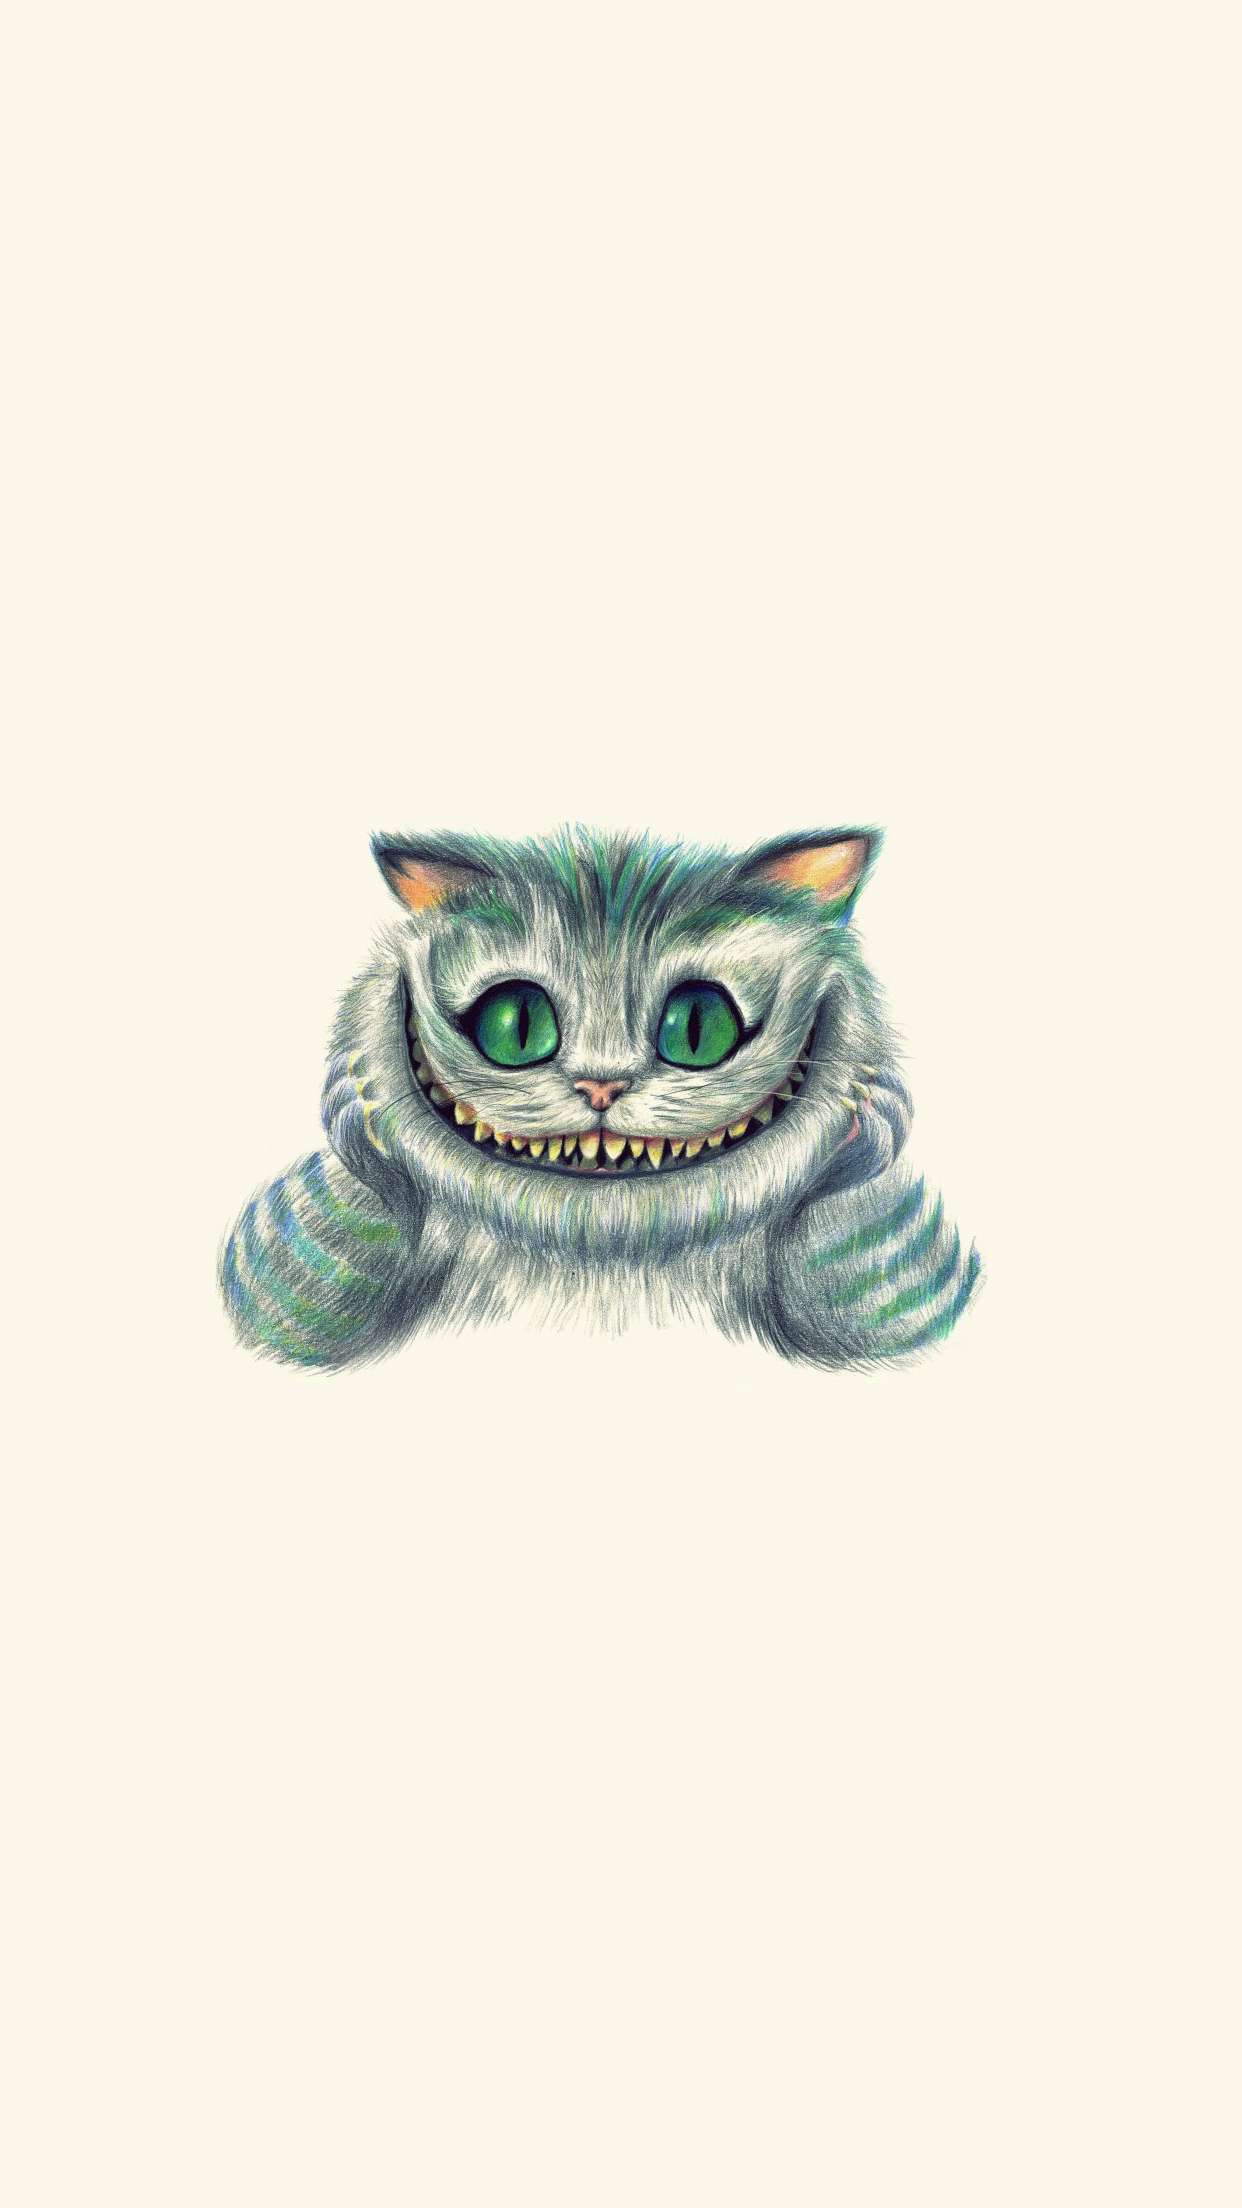 wallpaper hd iphone alice in wonderland cat free download